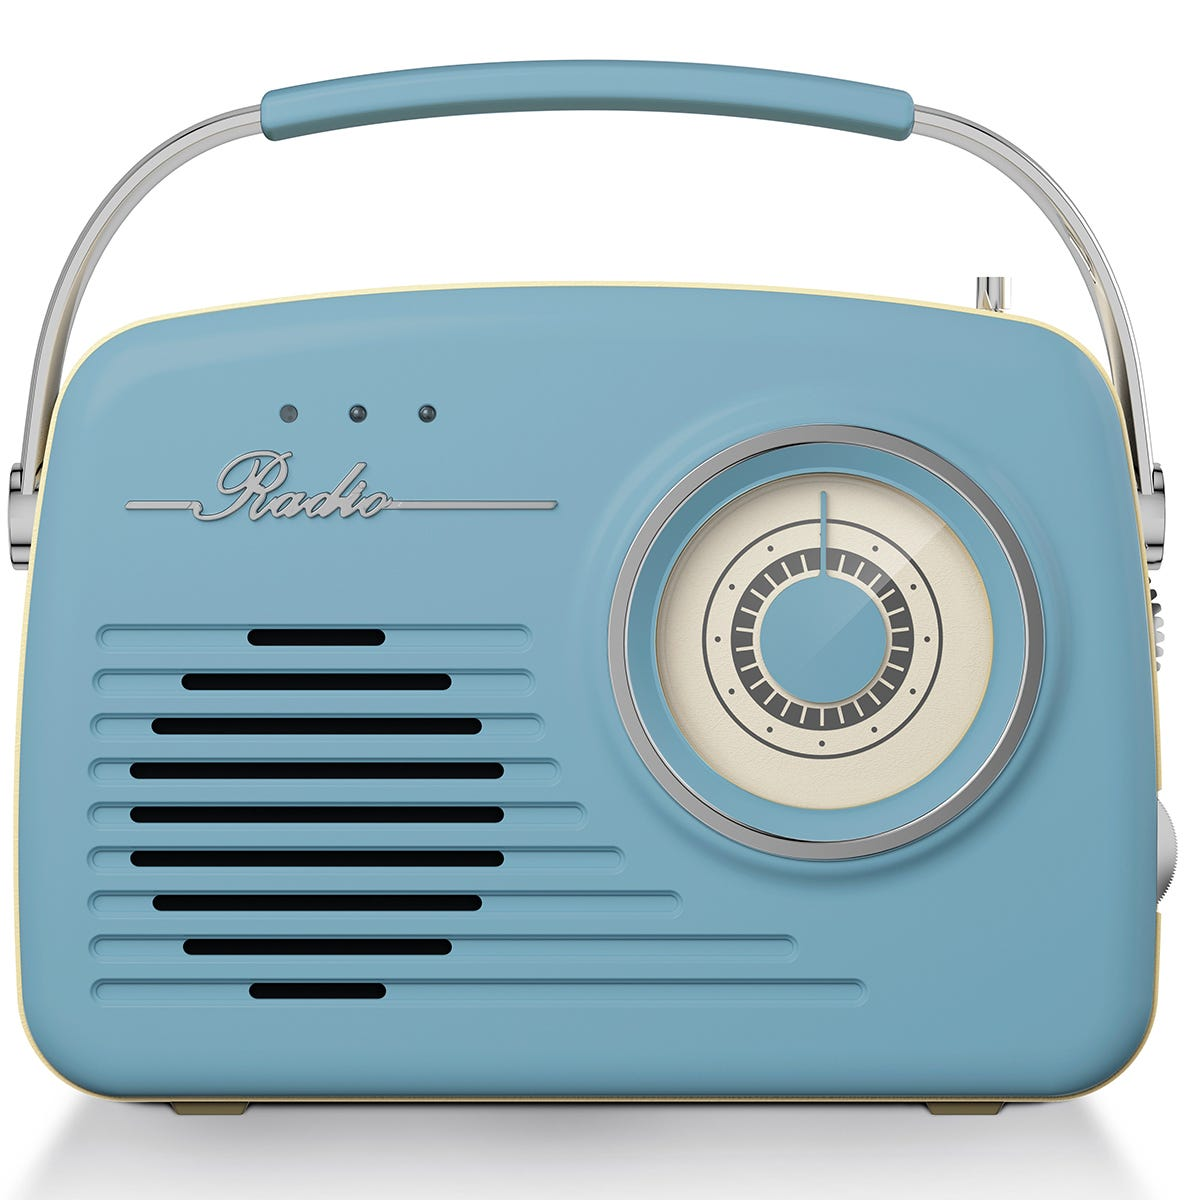 Akai A60014V Radio | Vintage FM radio